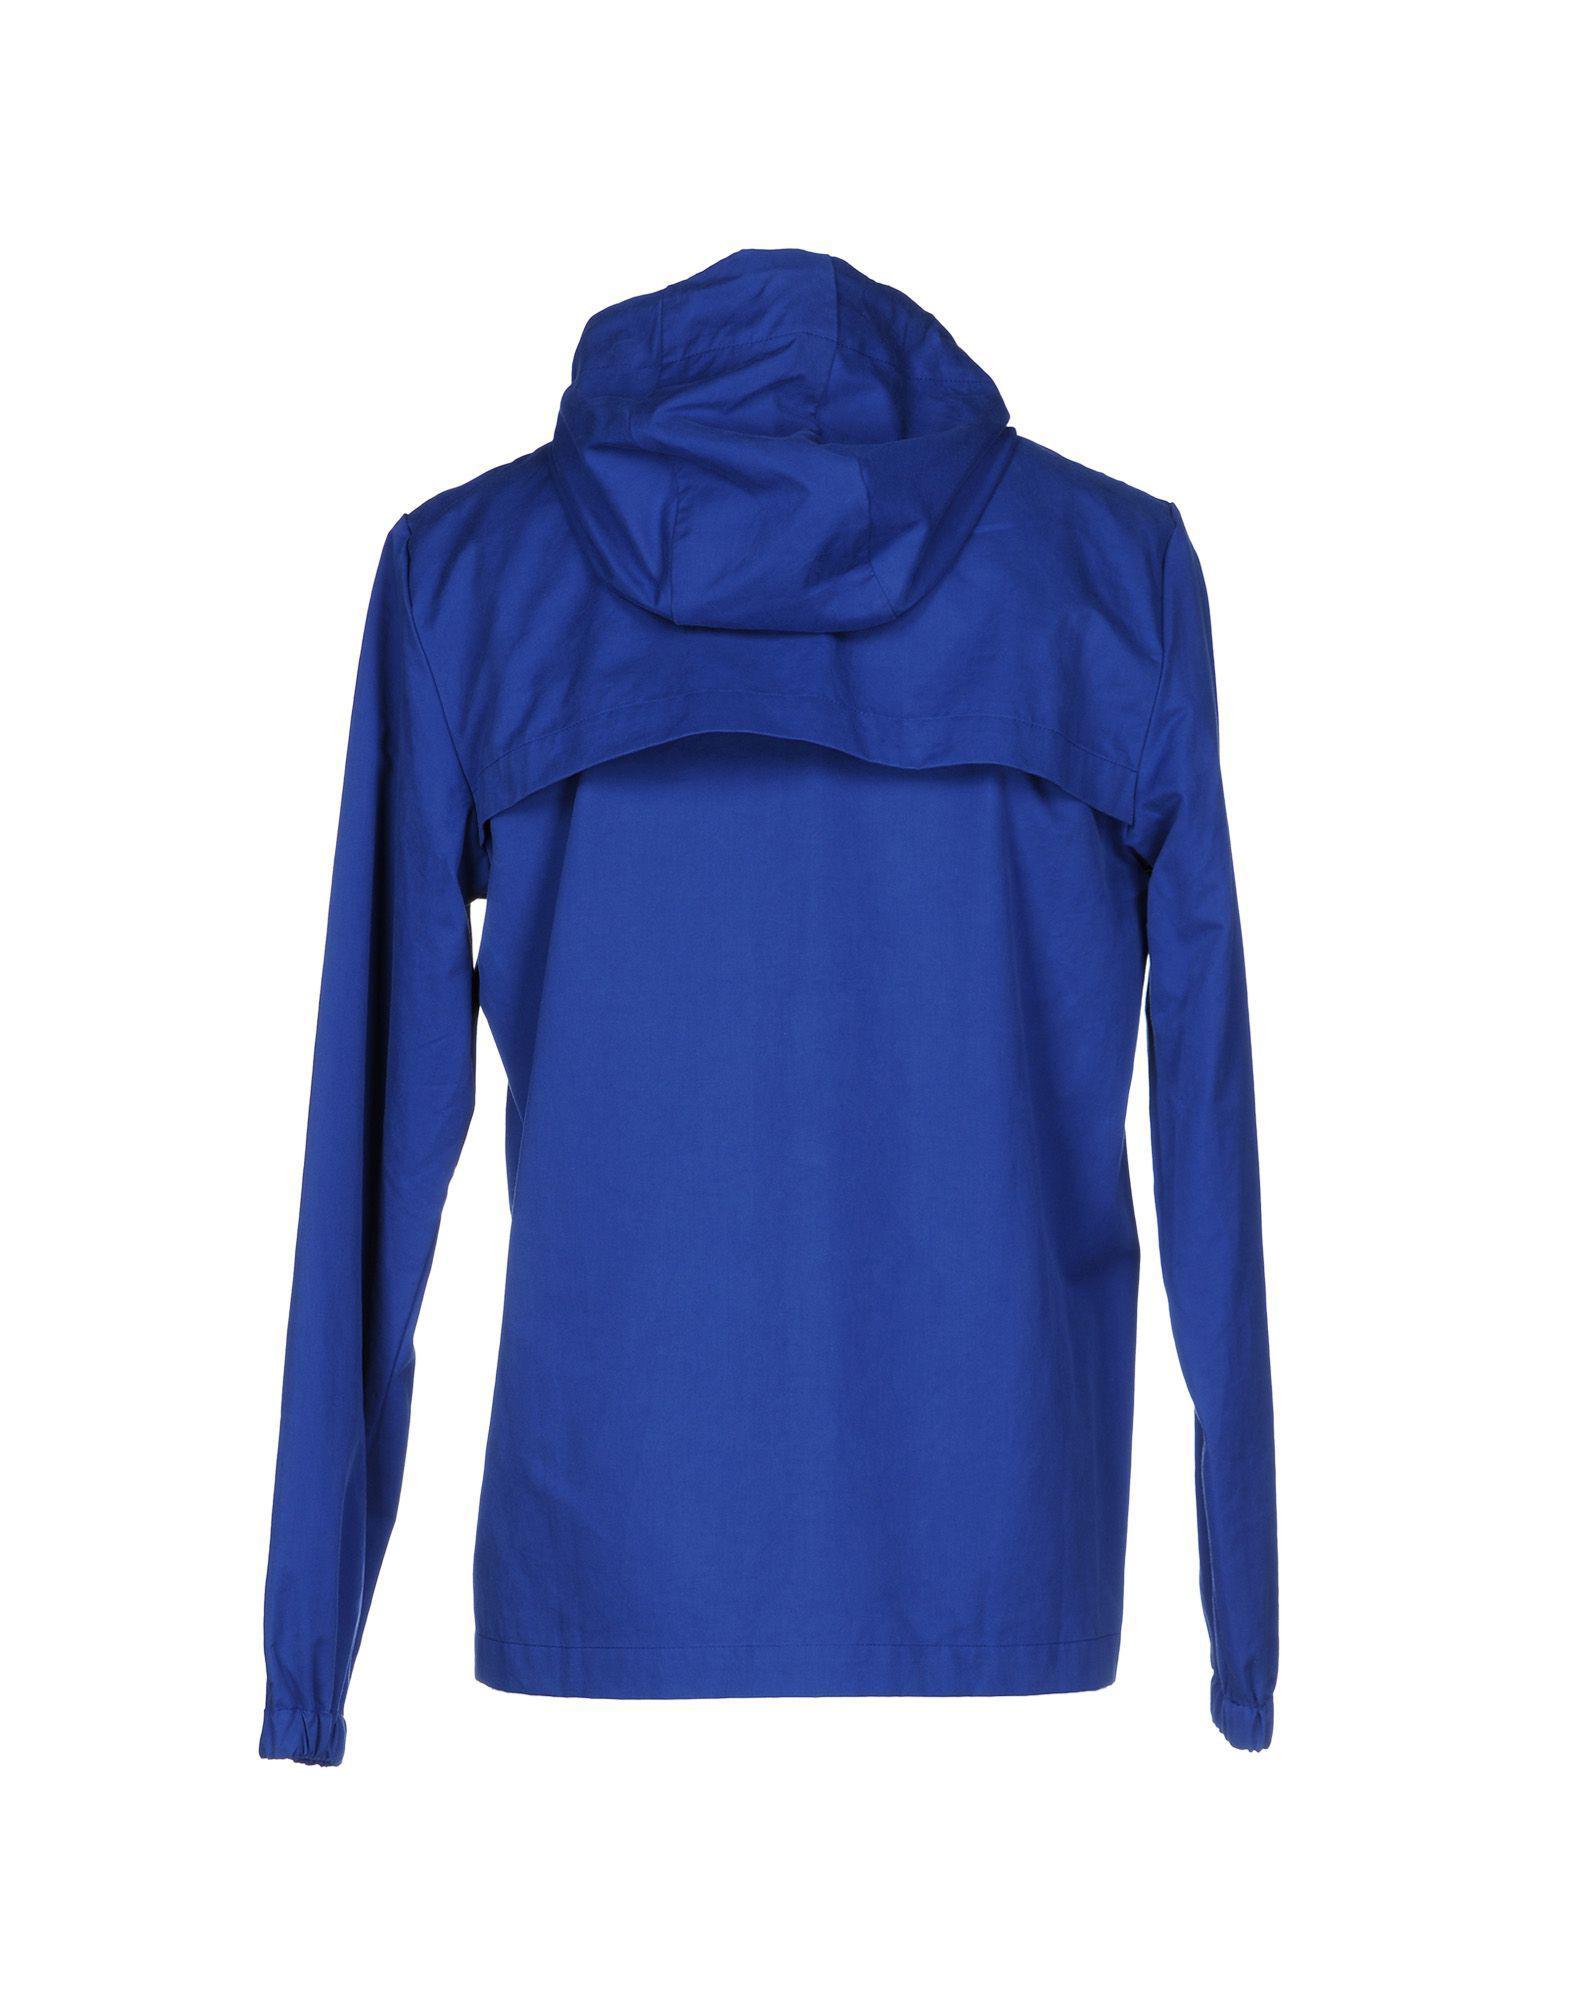 Christopher Raeburn Cotton Jacket in Blue for Men